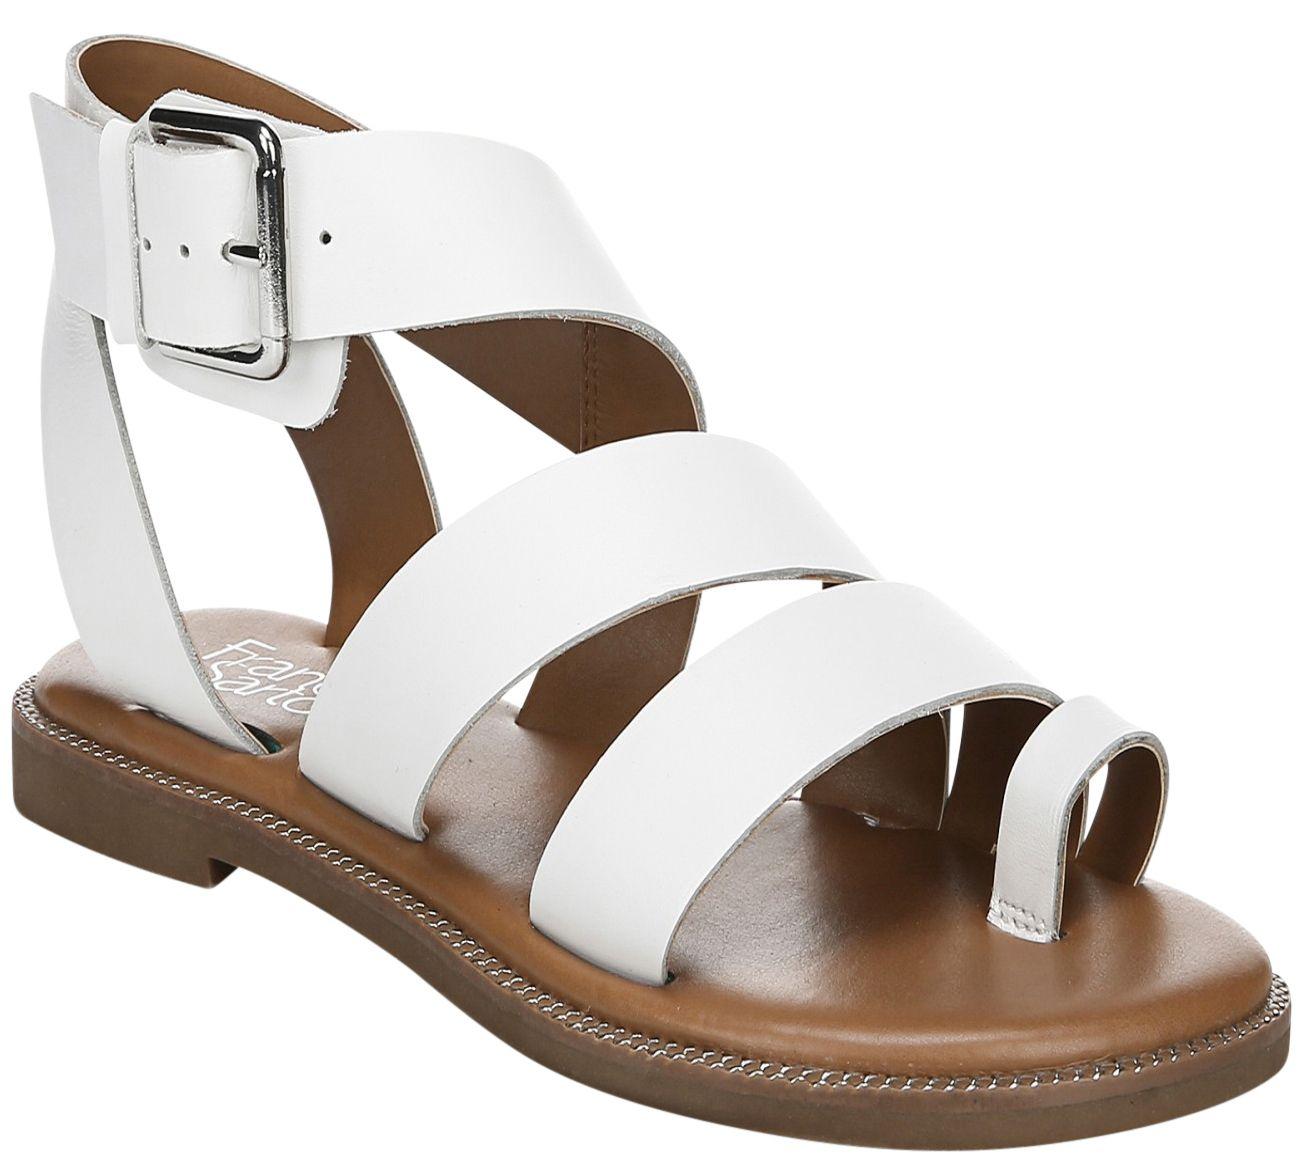 6e330cde2373 Franco Sarto Leather Gladiator Sandals - Kehlani - Page 1 — QVC.com